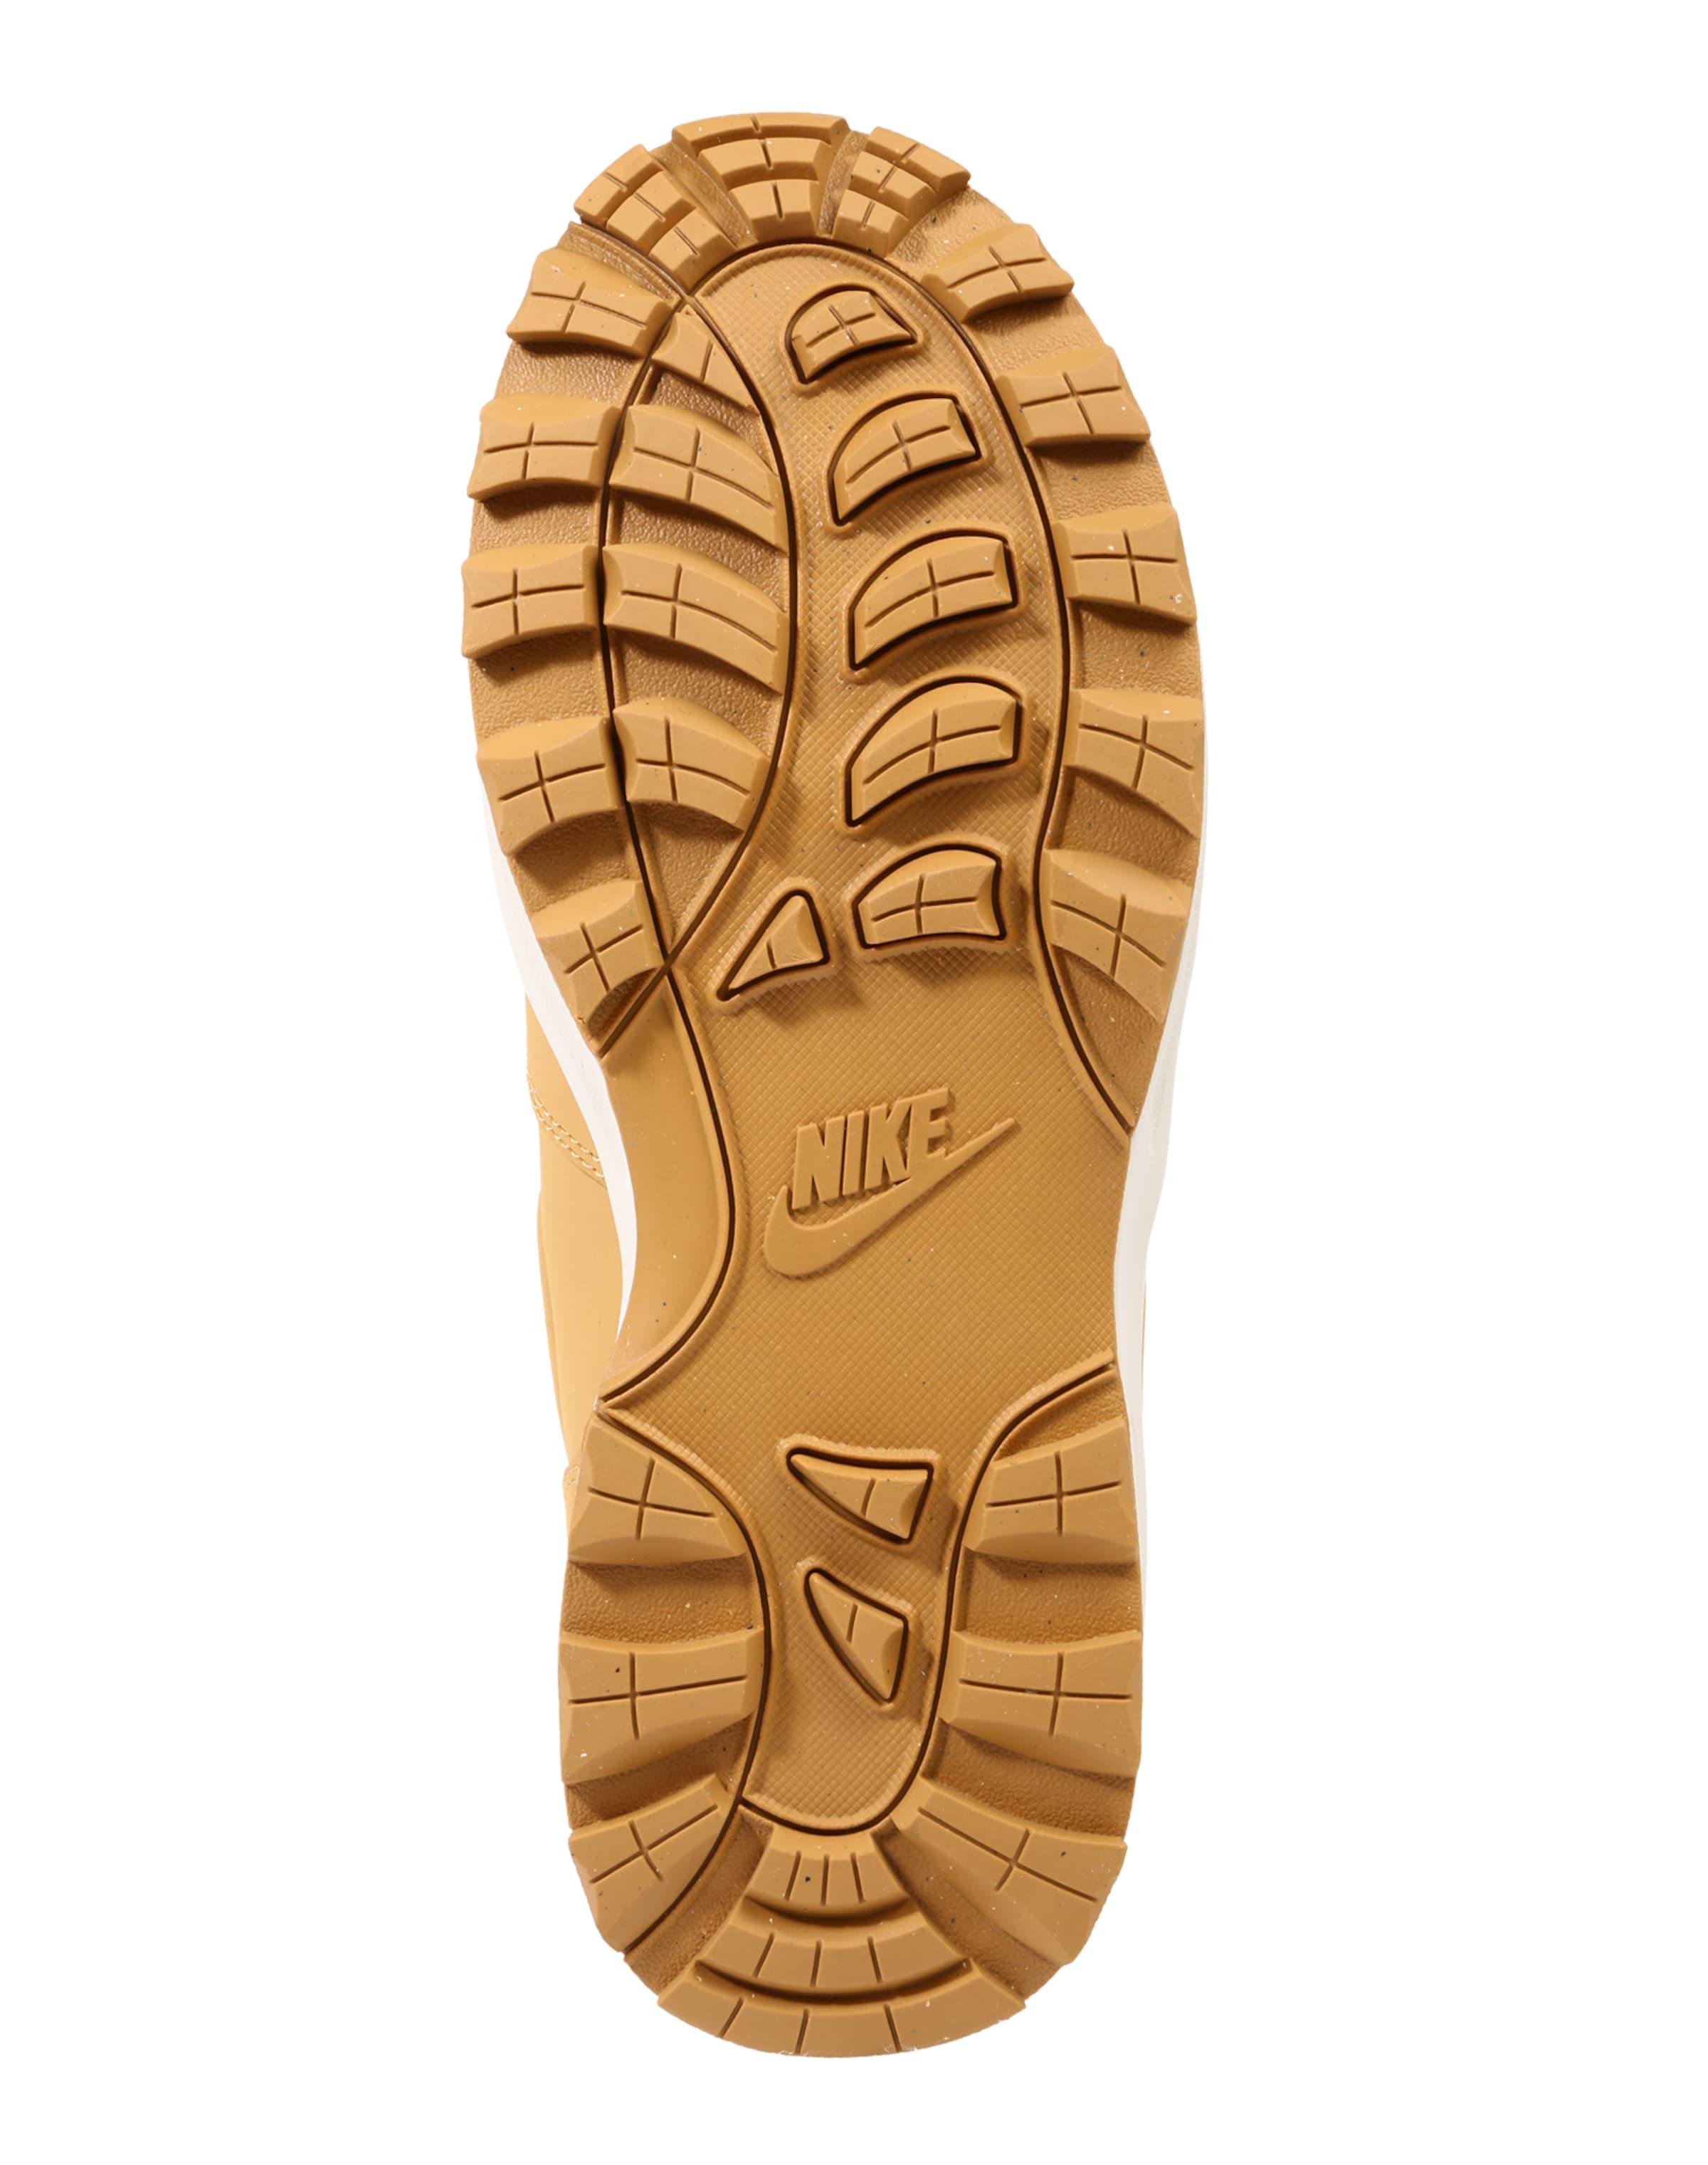 Nike Baskets Hautes Sable En 'manoa' Sportswear xWrCedBo